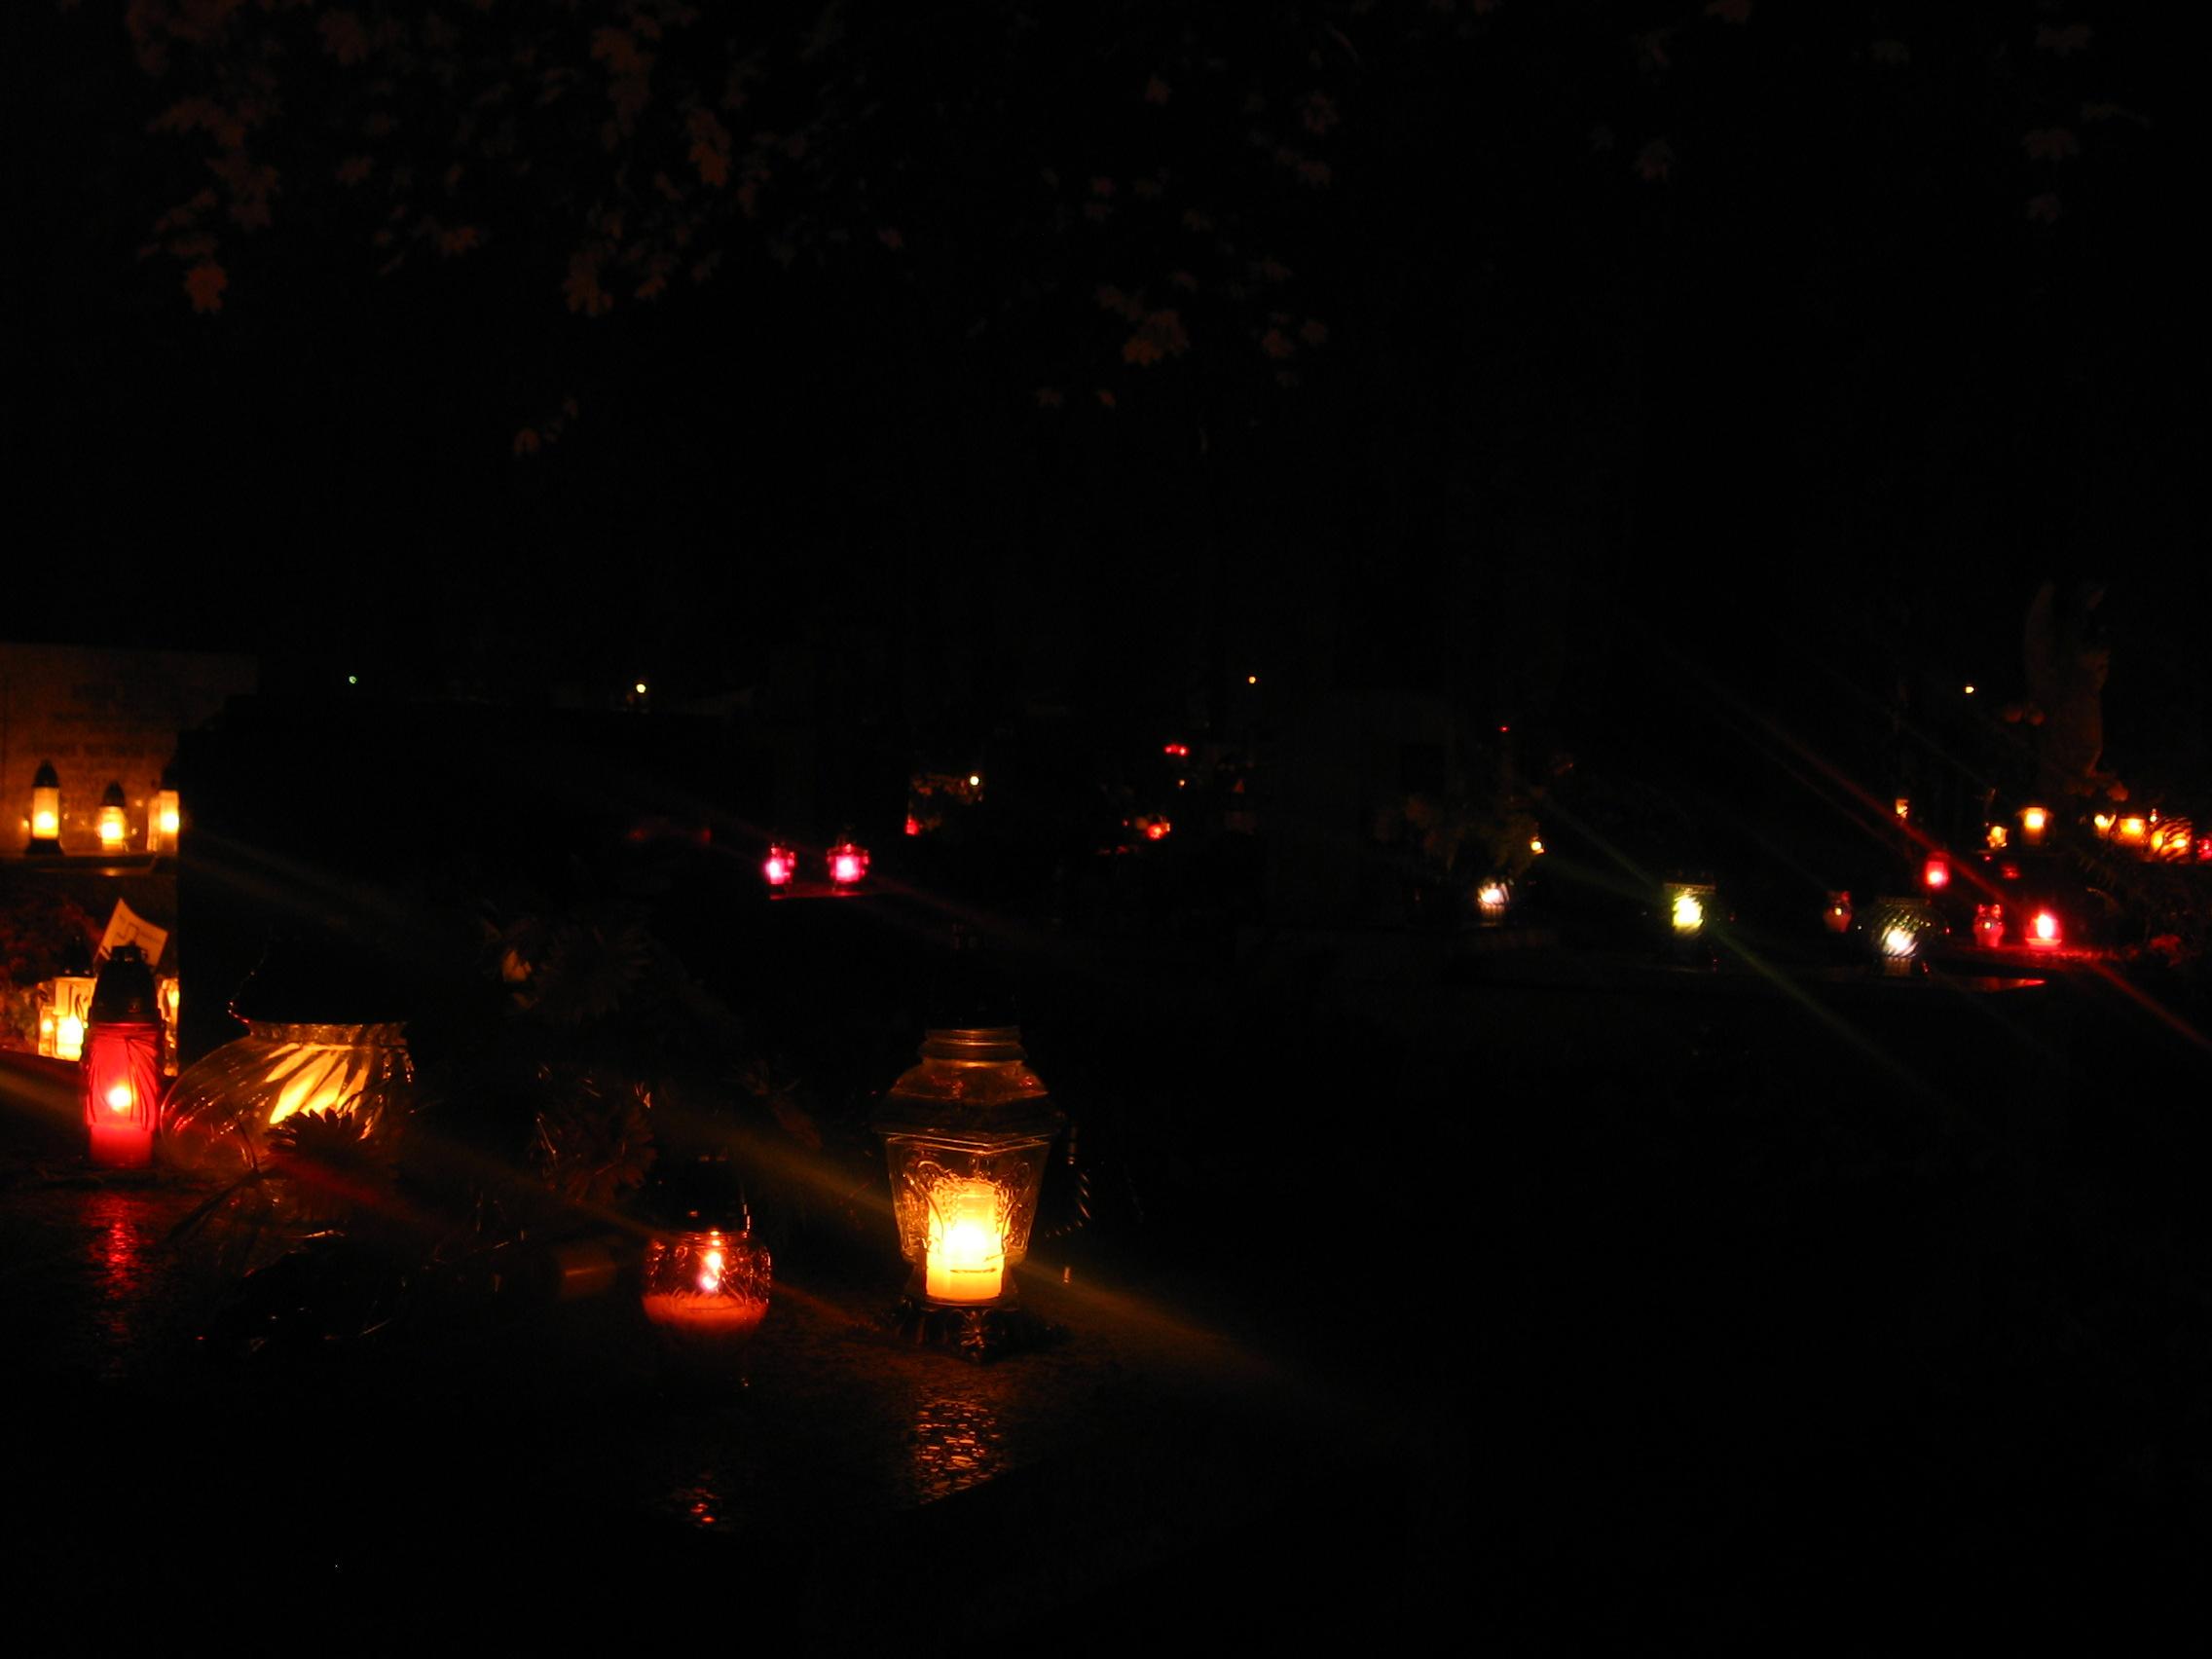 Картинки по запросу кладбище ночь